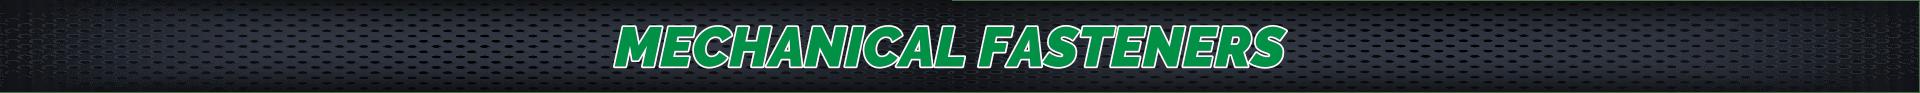 full_width_mechanical _fasteners_banner-min